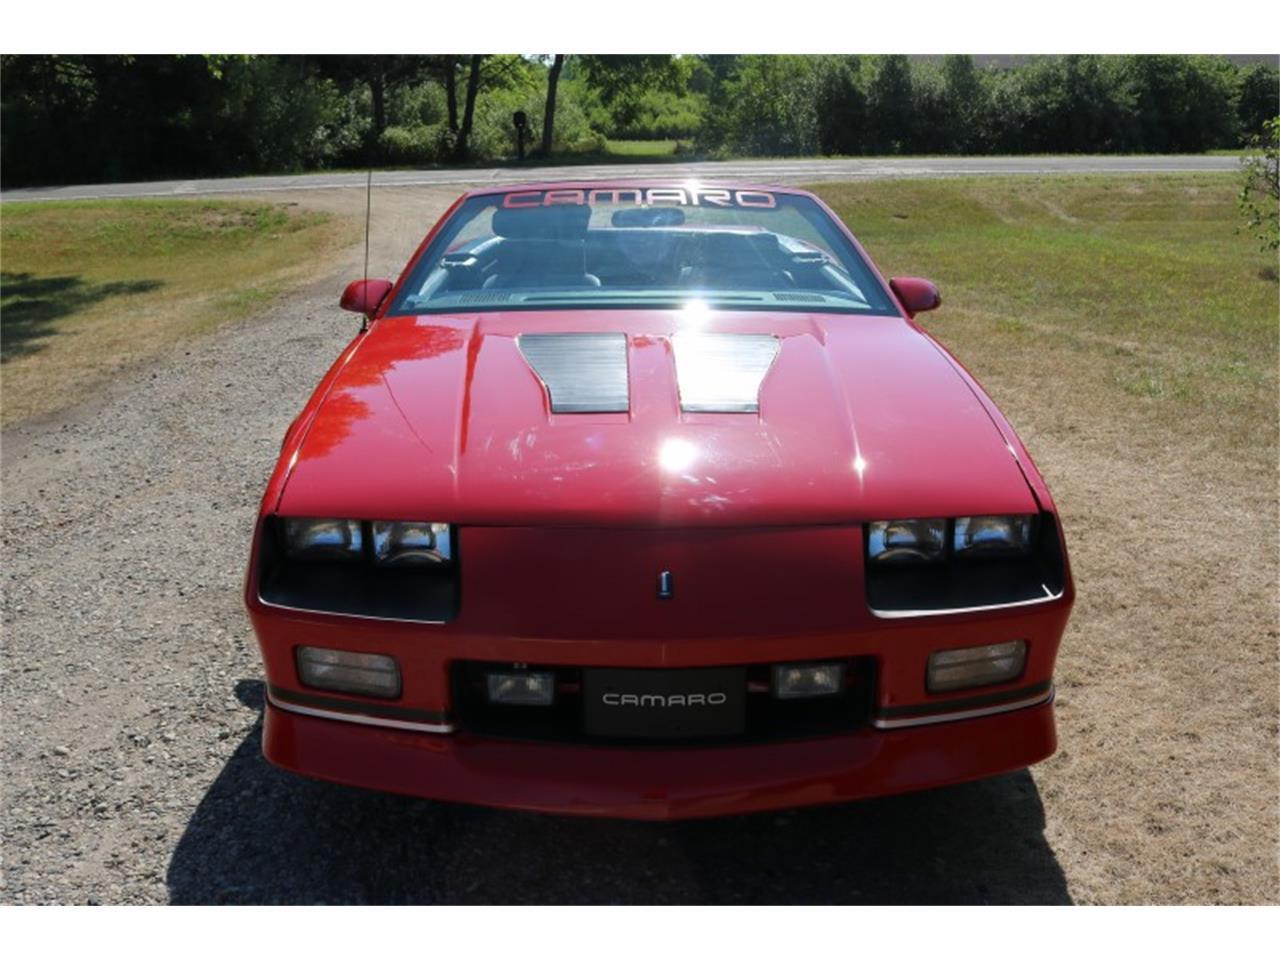 1988 Chevrolet Camaro IROC Z28 (CC-1362058) for sale in Columbiaville, Michigan